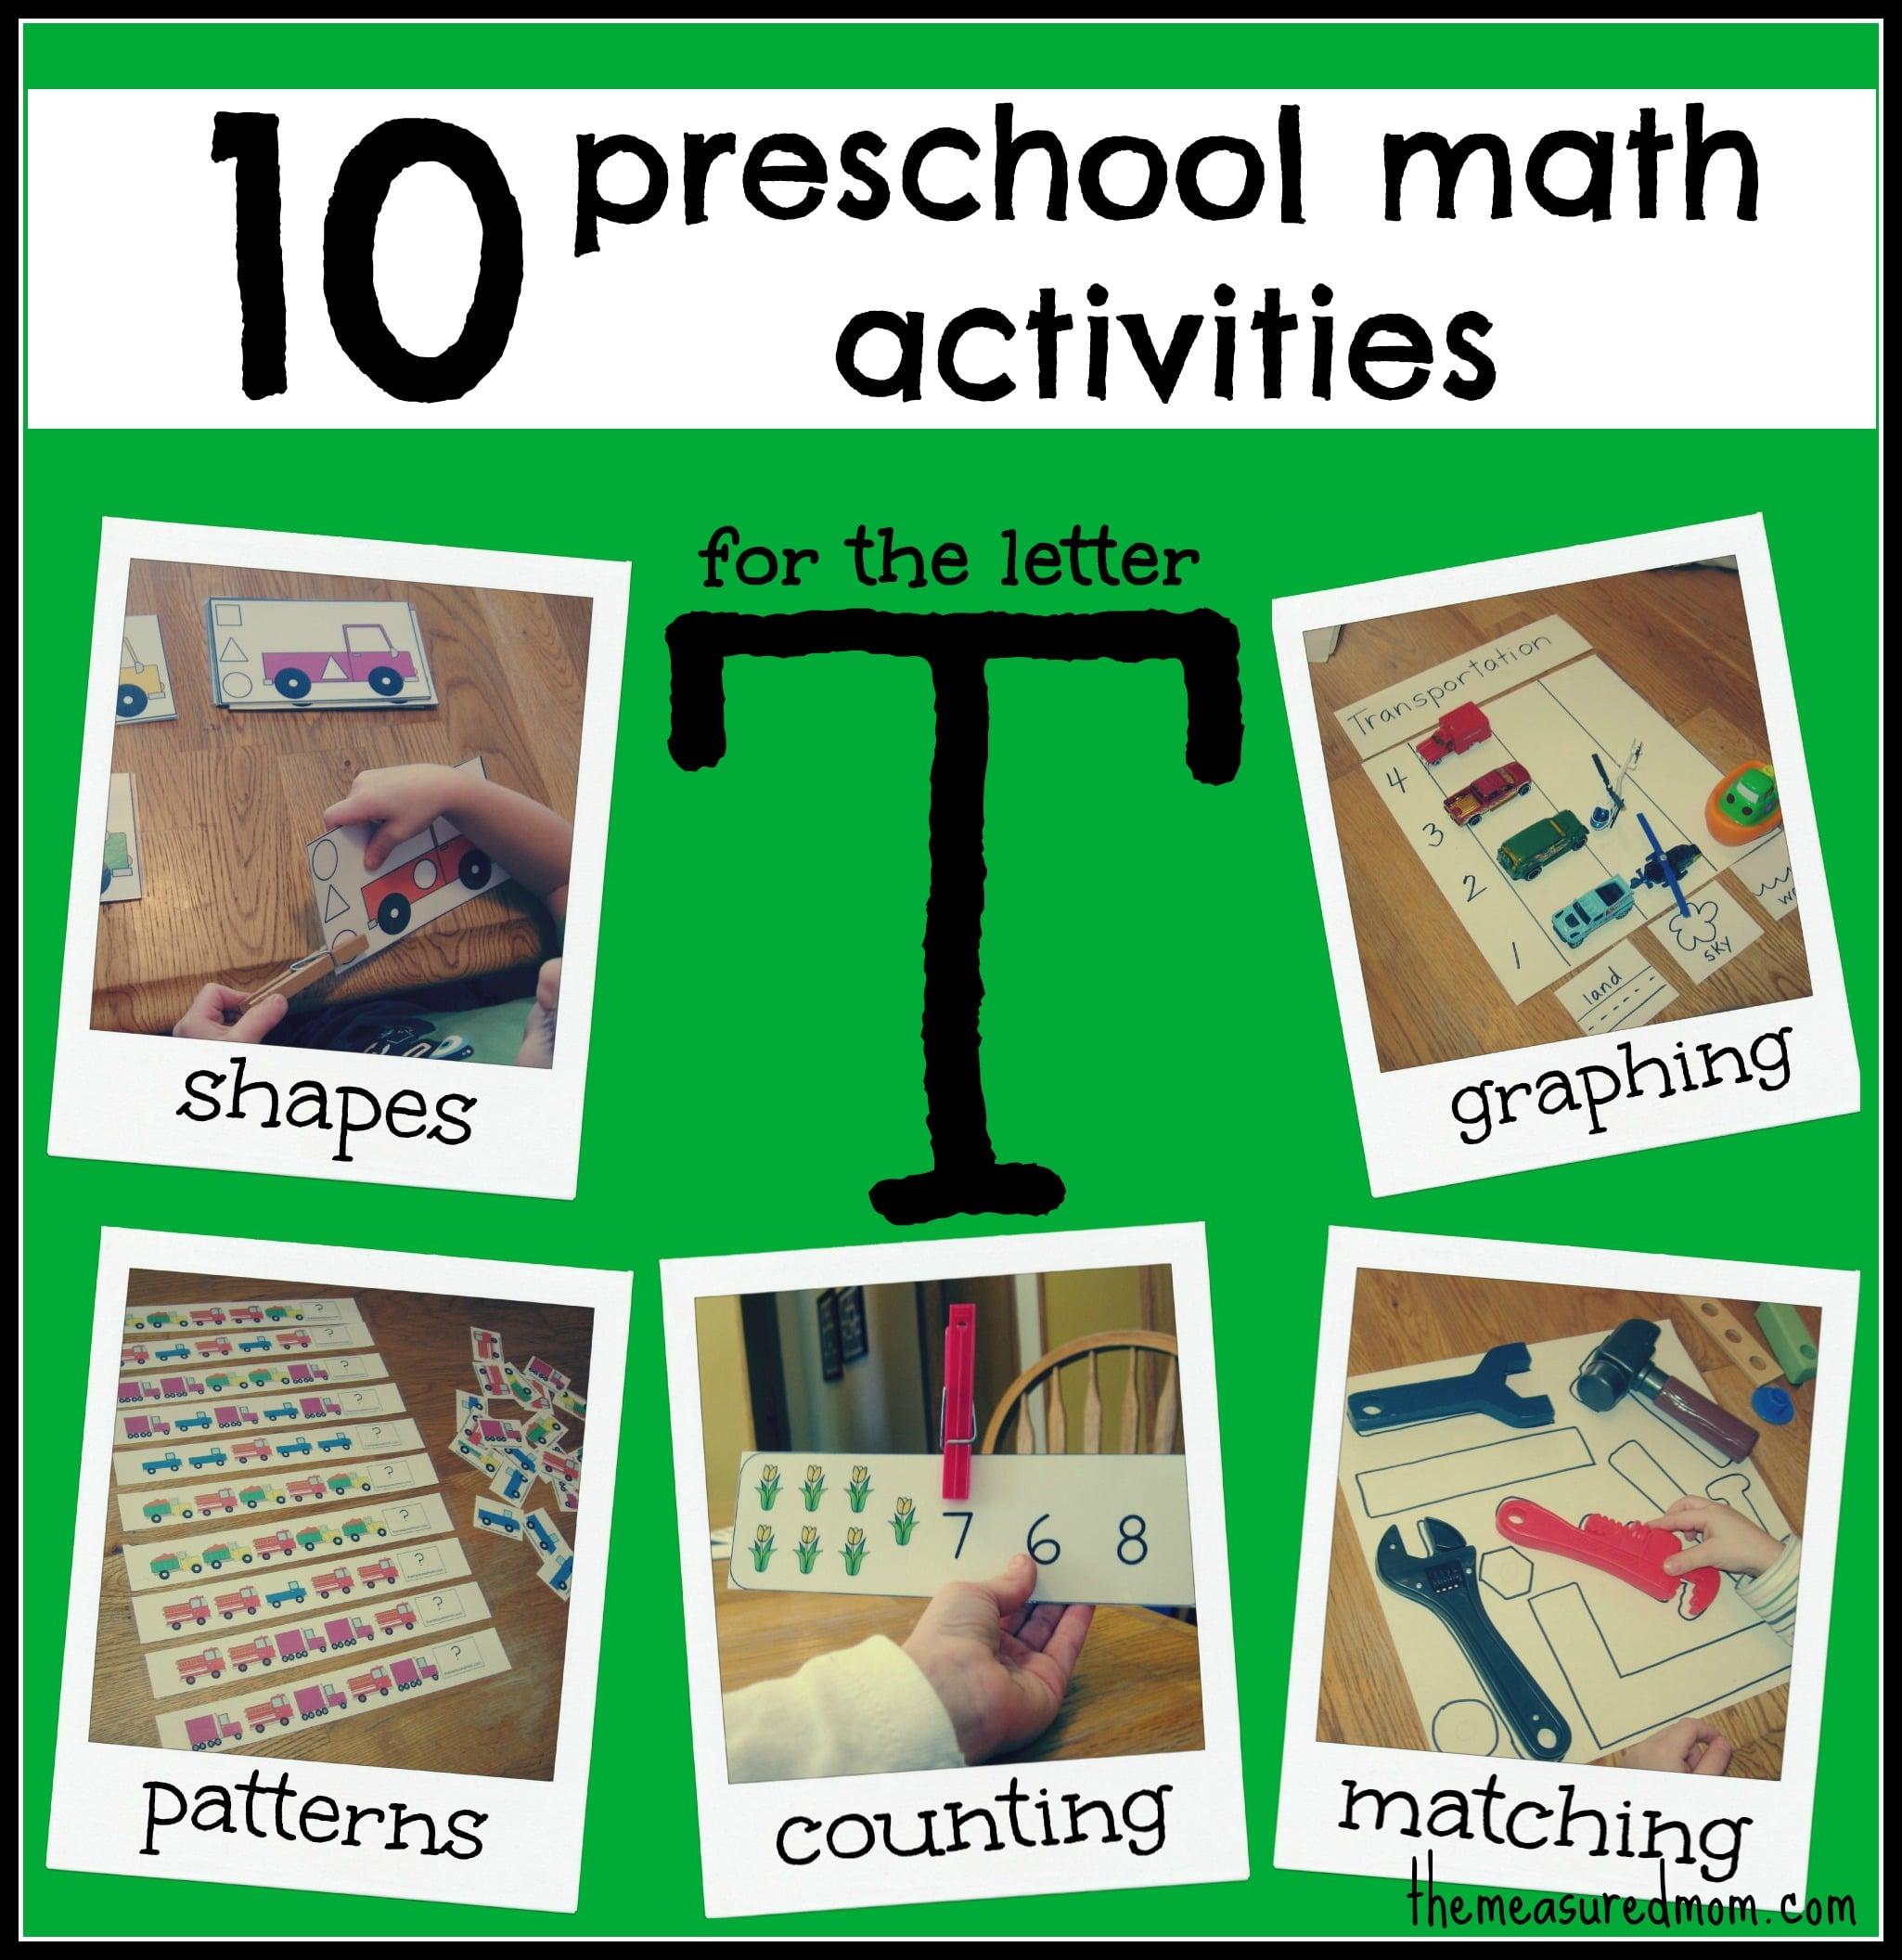 10 Preschool Math Activities (the Letter T)